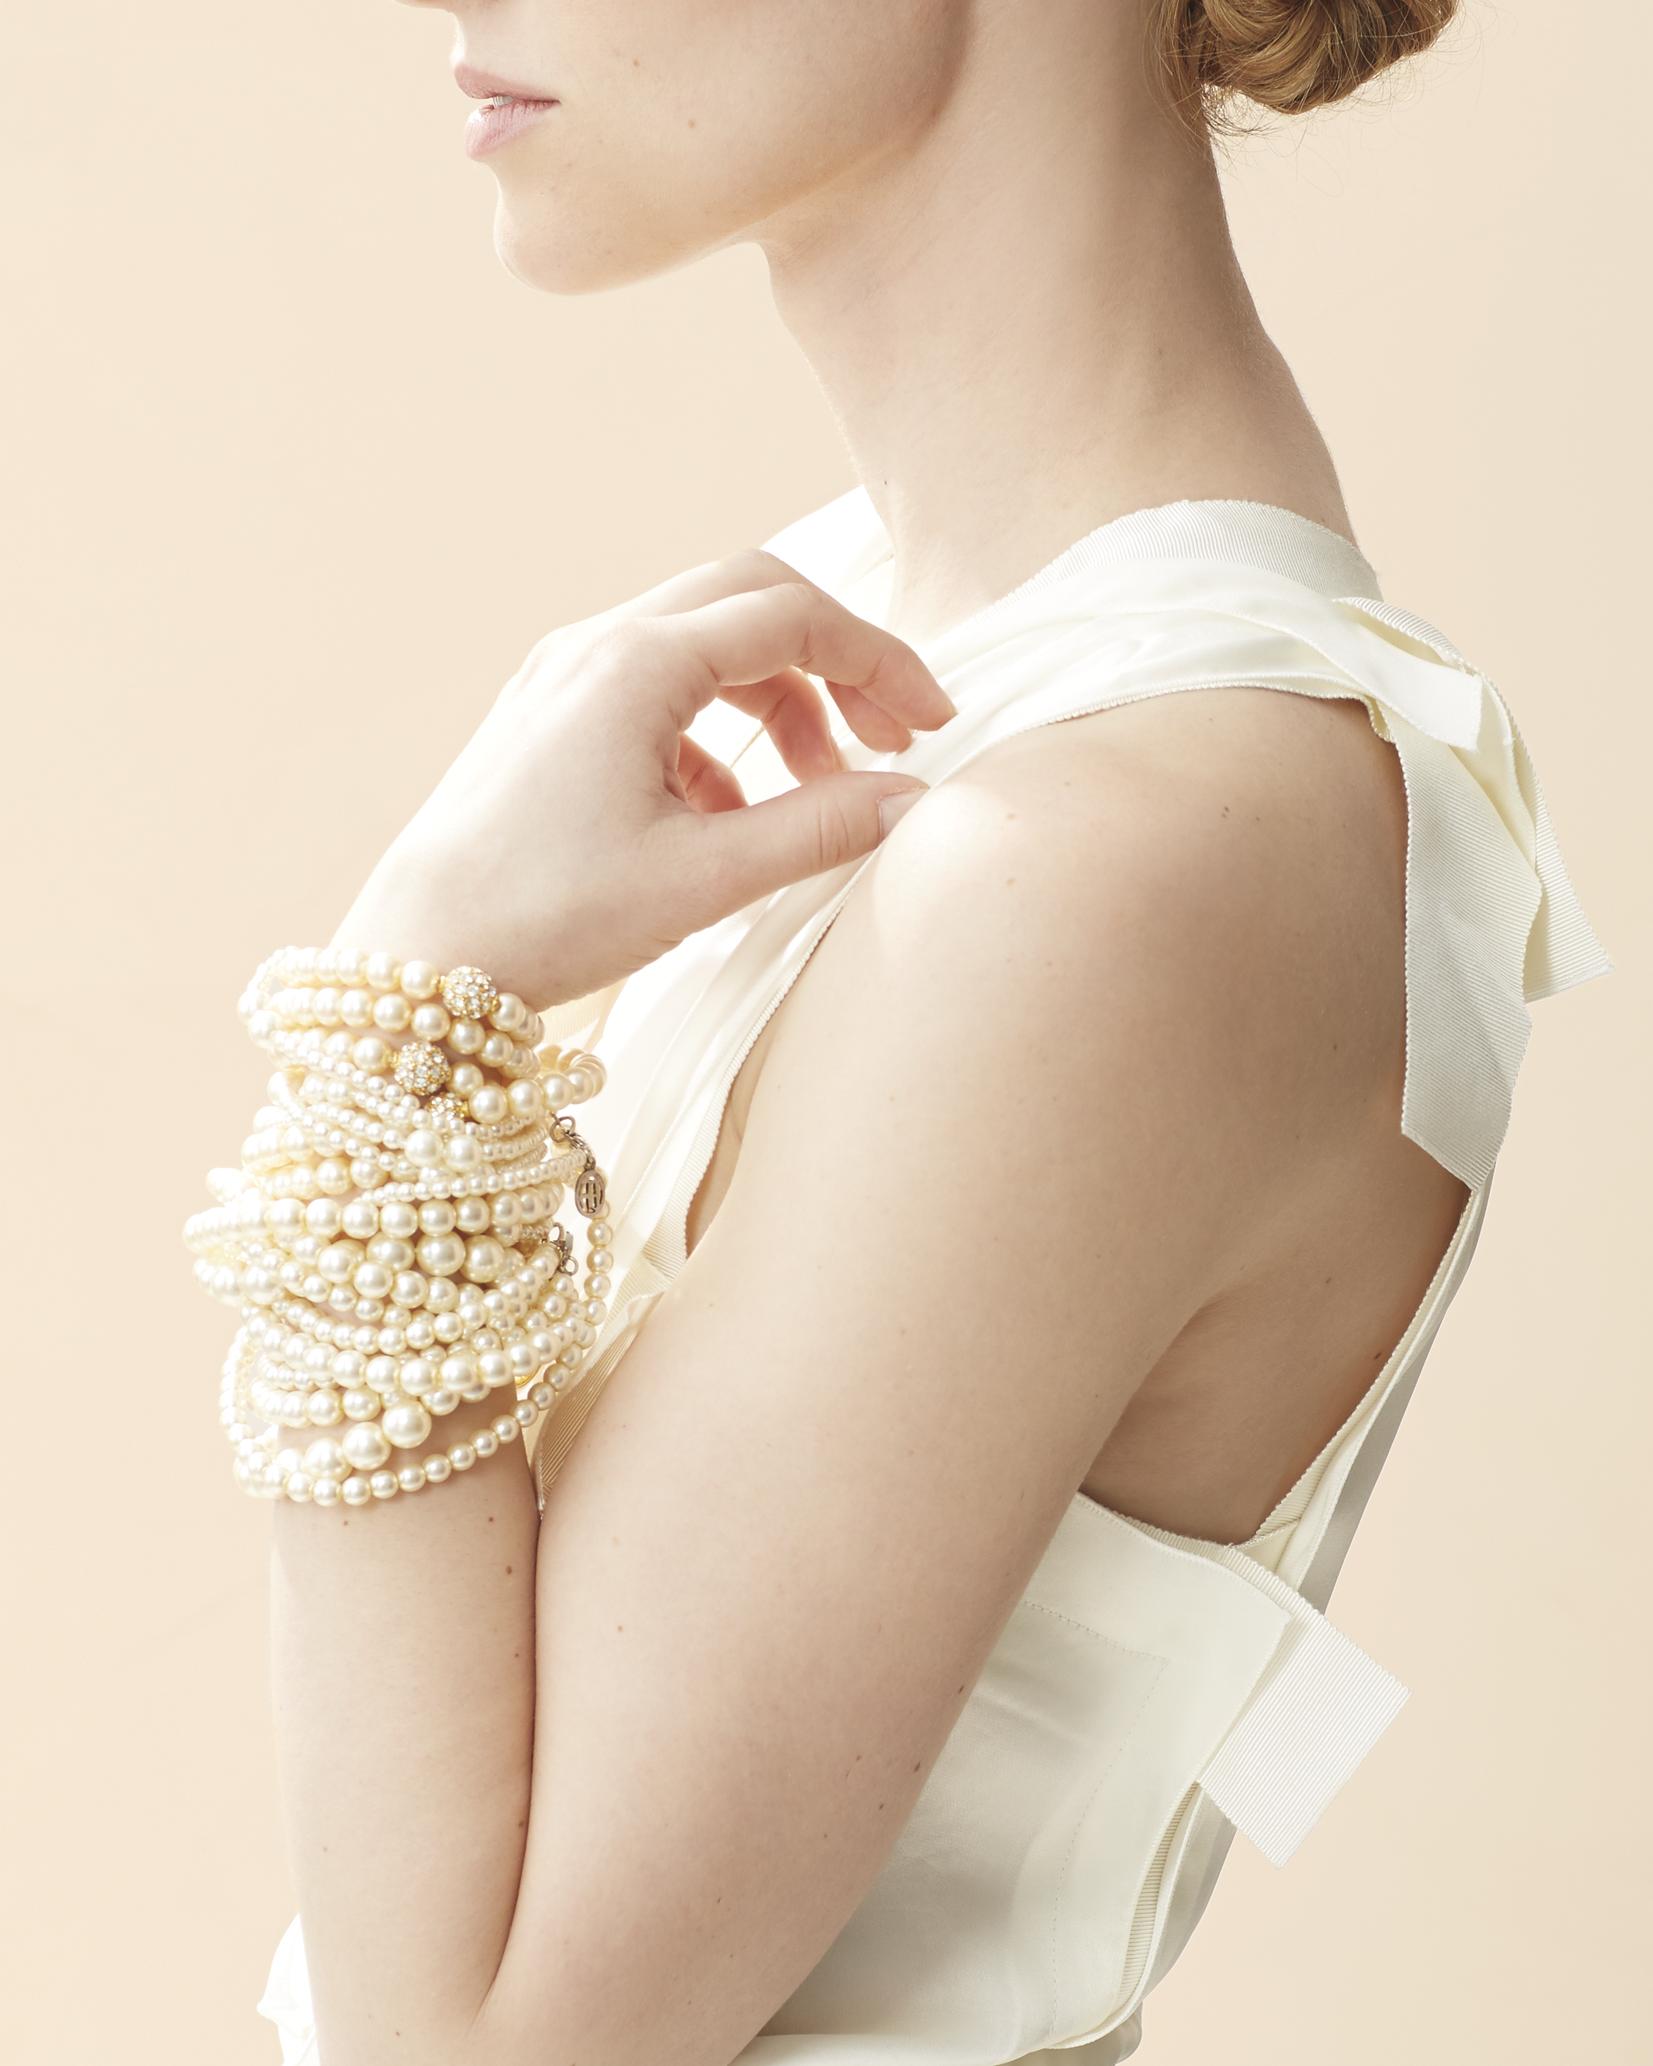 bracelets-232-d111930.jpg